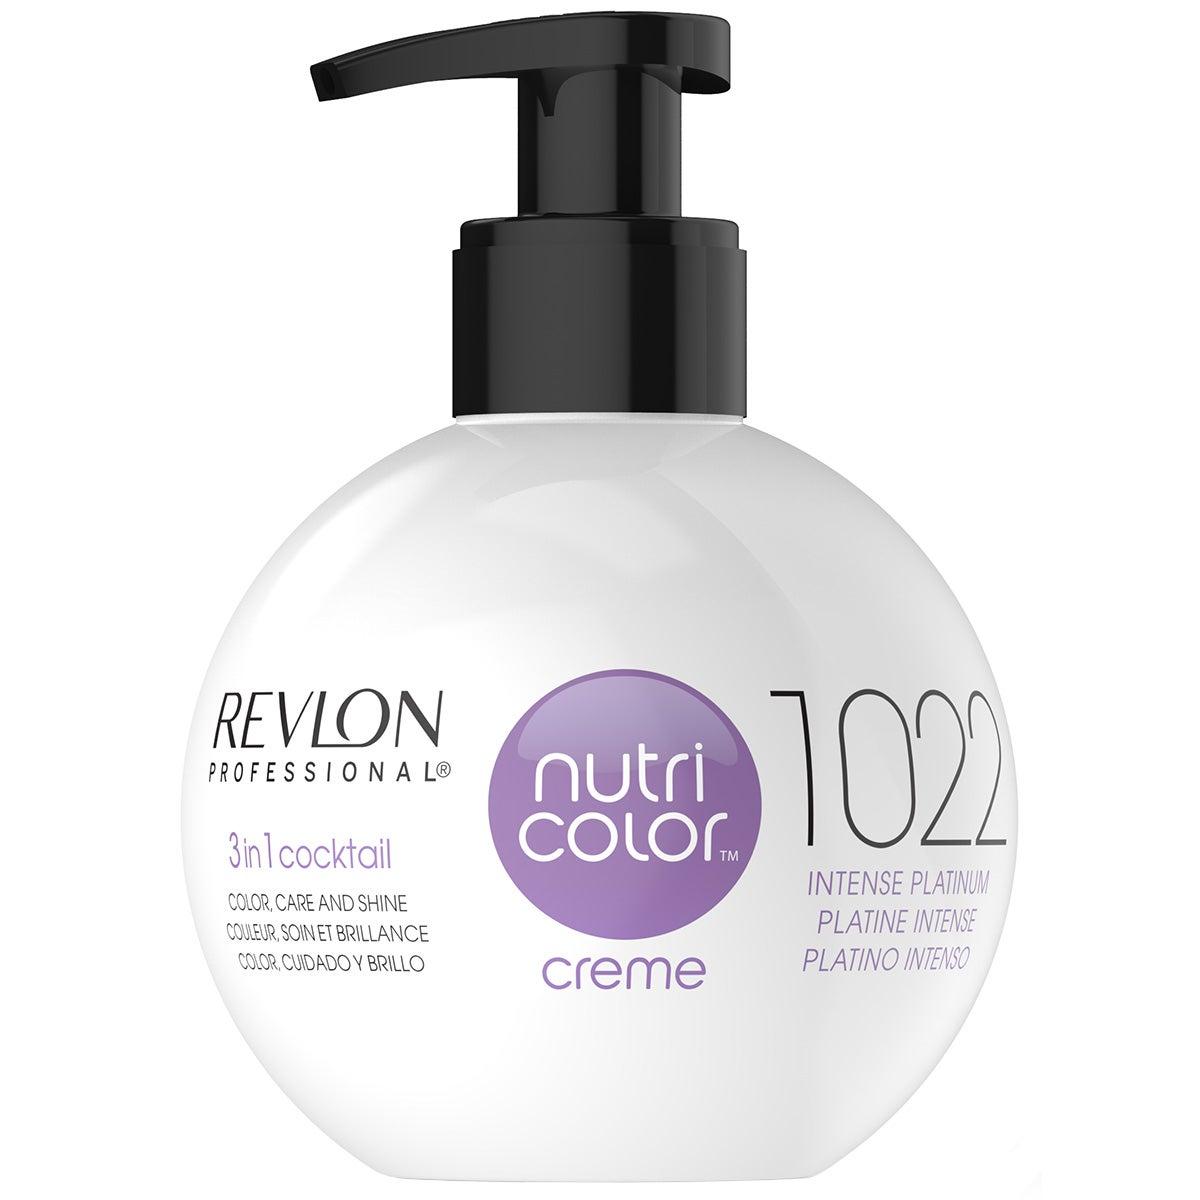 Nutri Color Creme 1022 Intense Platinum 270 ml Revlon Professional Alla hårfärger